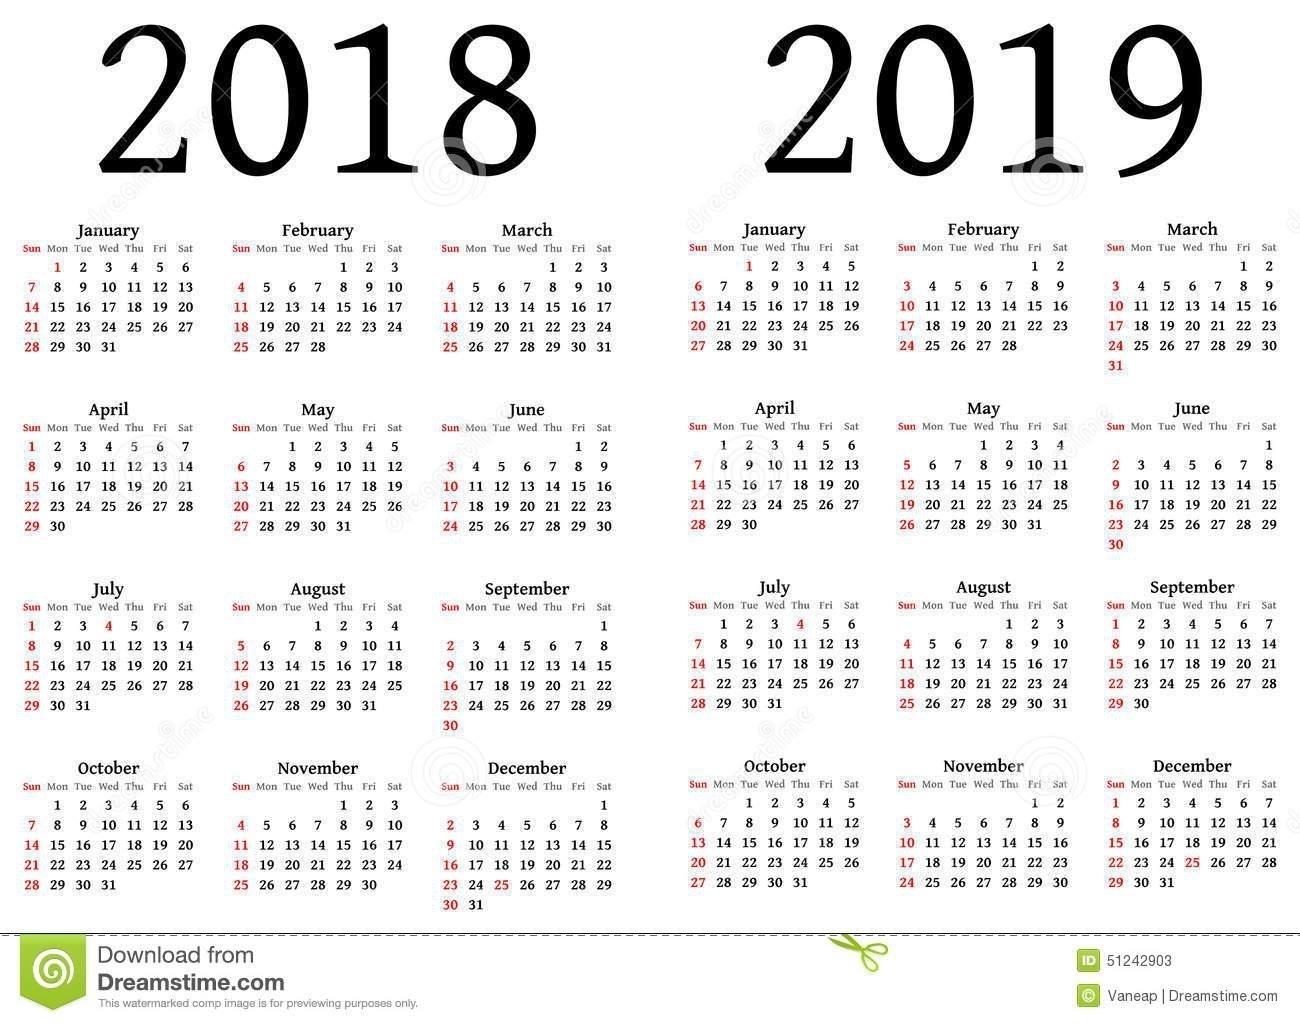 Catch Julian Calendar July 16